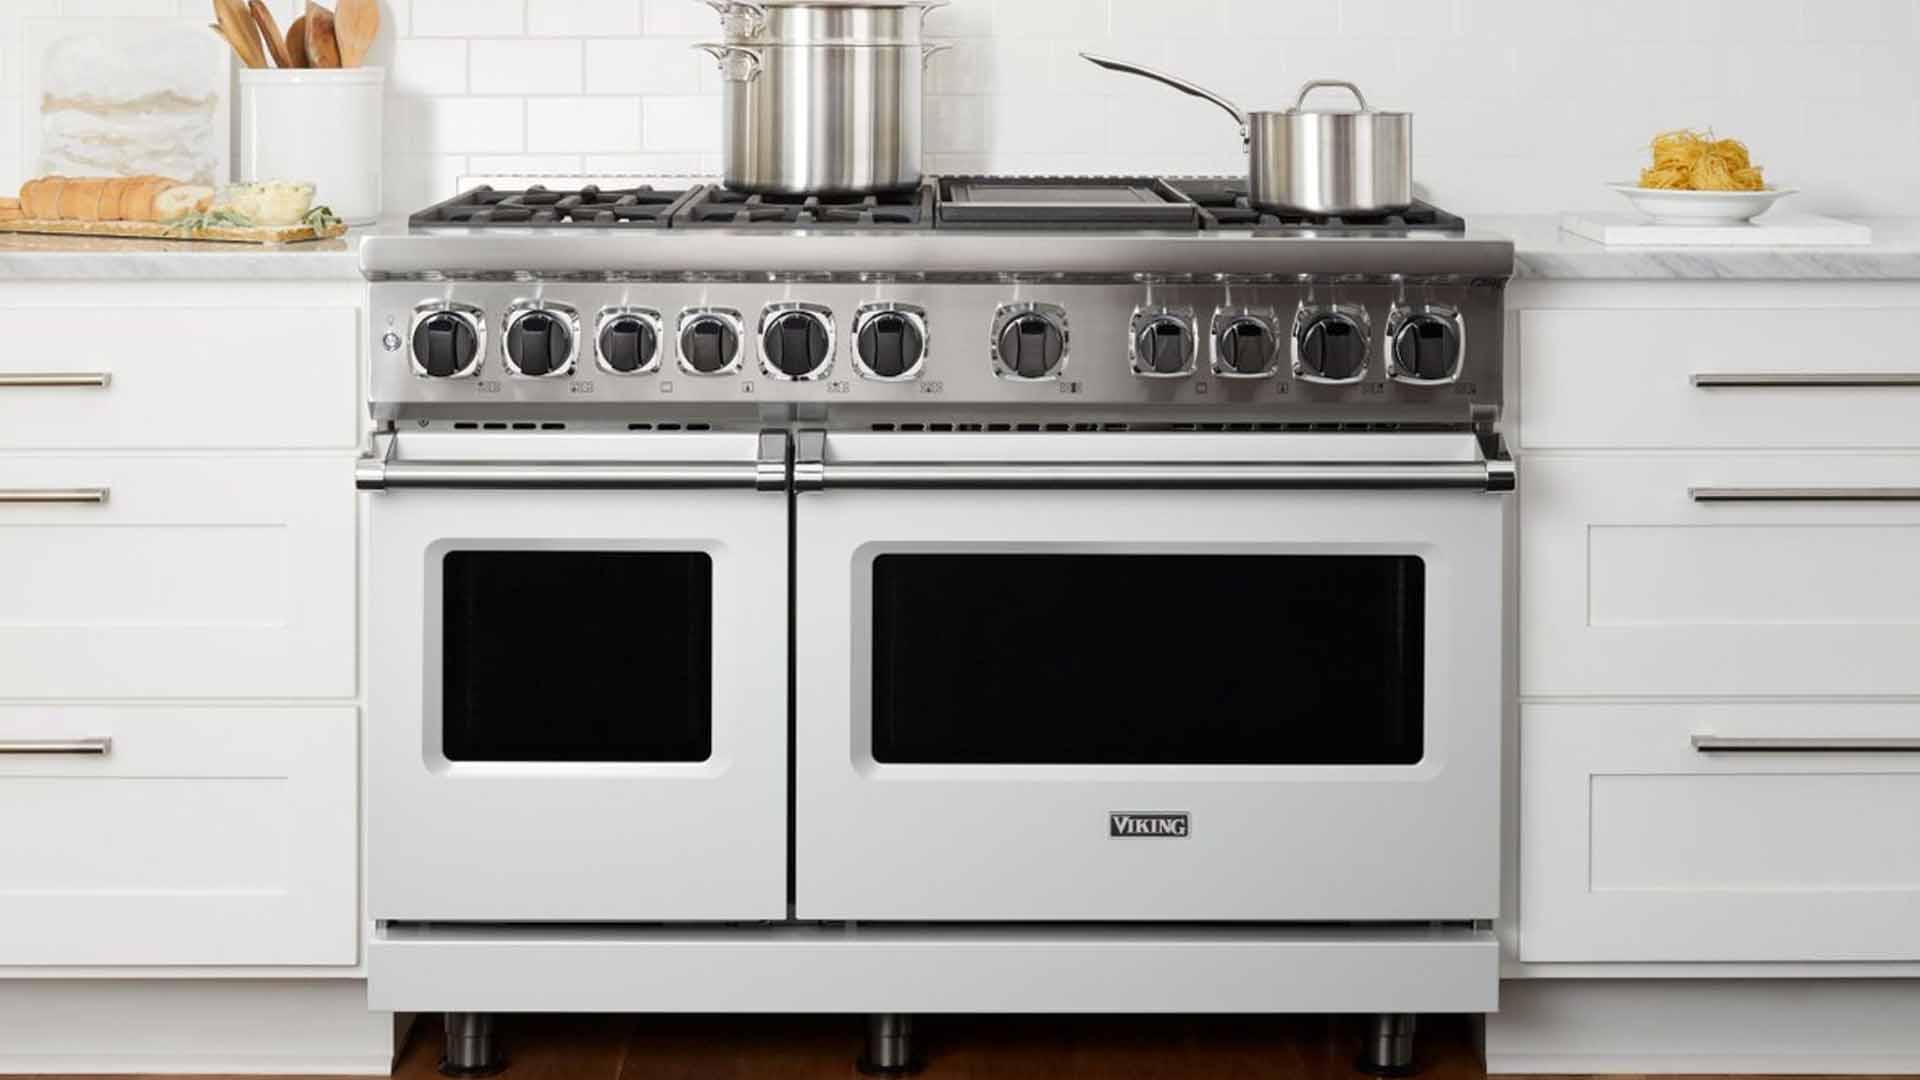 Viking Double Oven Repair Service   Viking Appliance Repairs